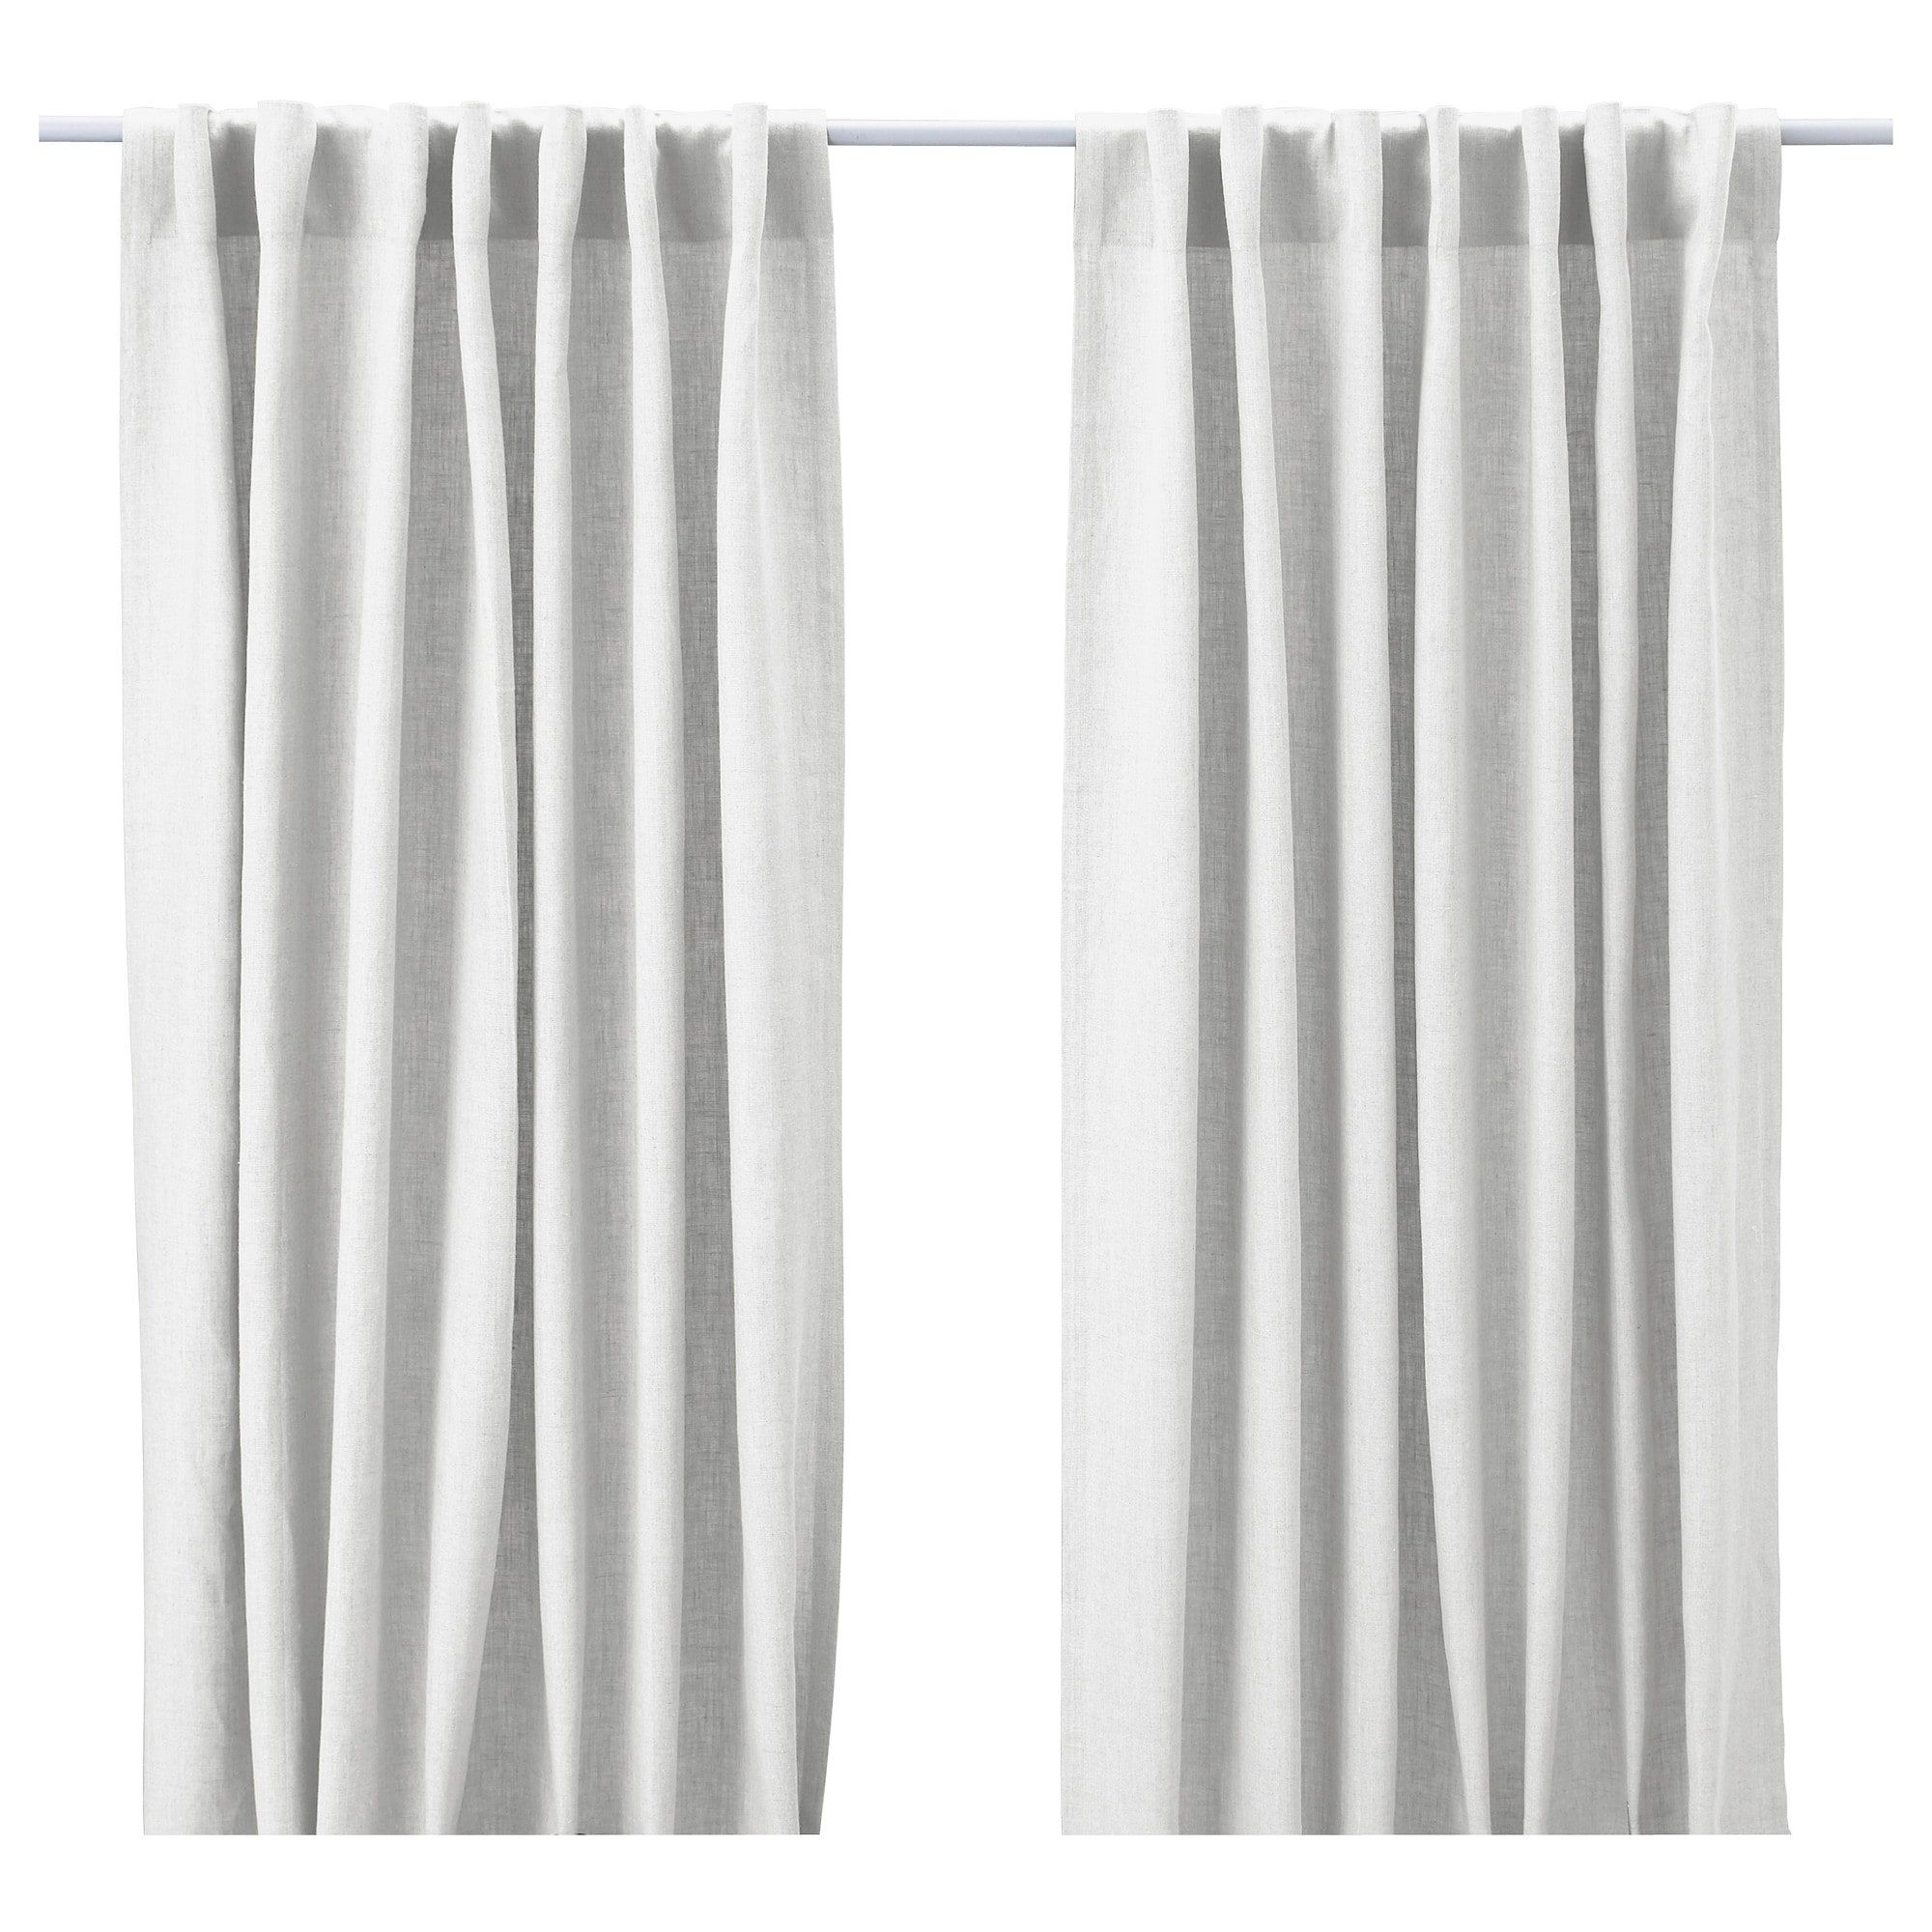 Aina Curtains 1 Pair Ikea White Linen Window Panels Side